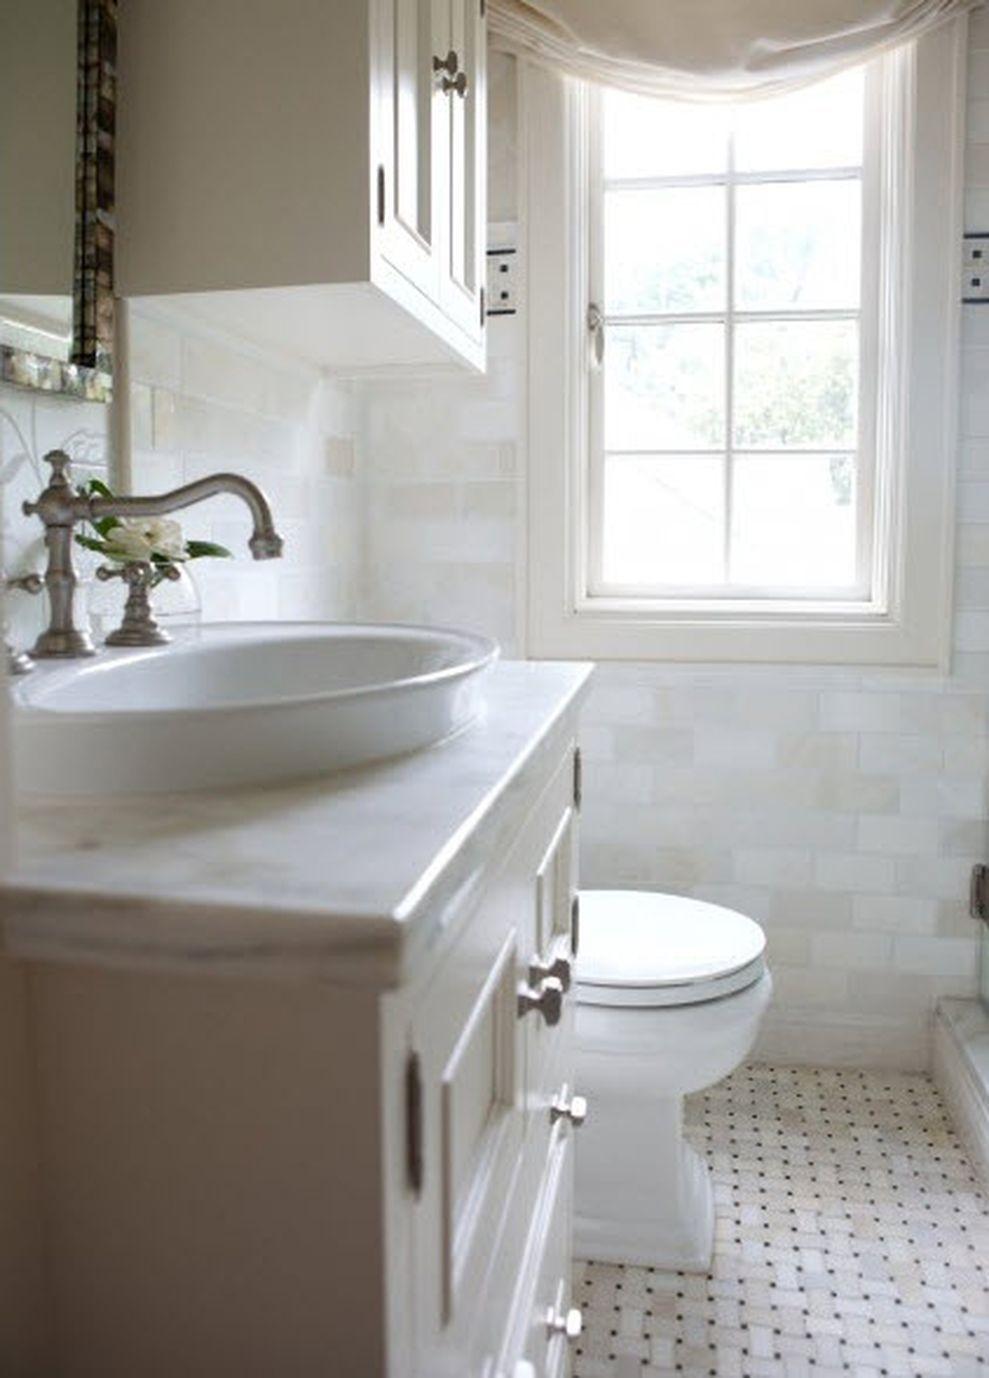 Small Bathroom Designs On A Budget 29 Tiny Bathroom Remodel Ideas On A Budget  Tiny Bathrooms